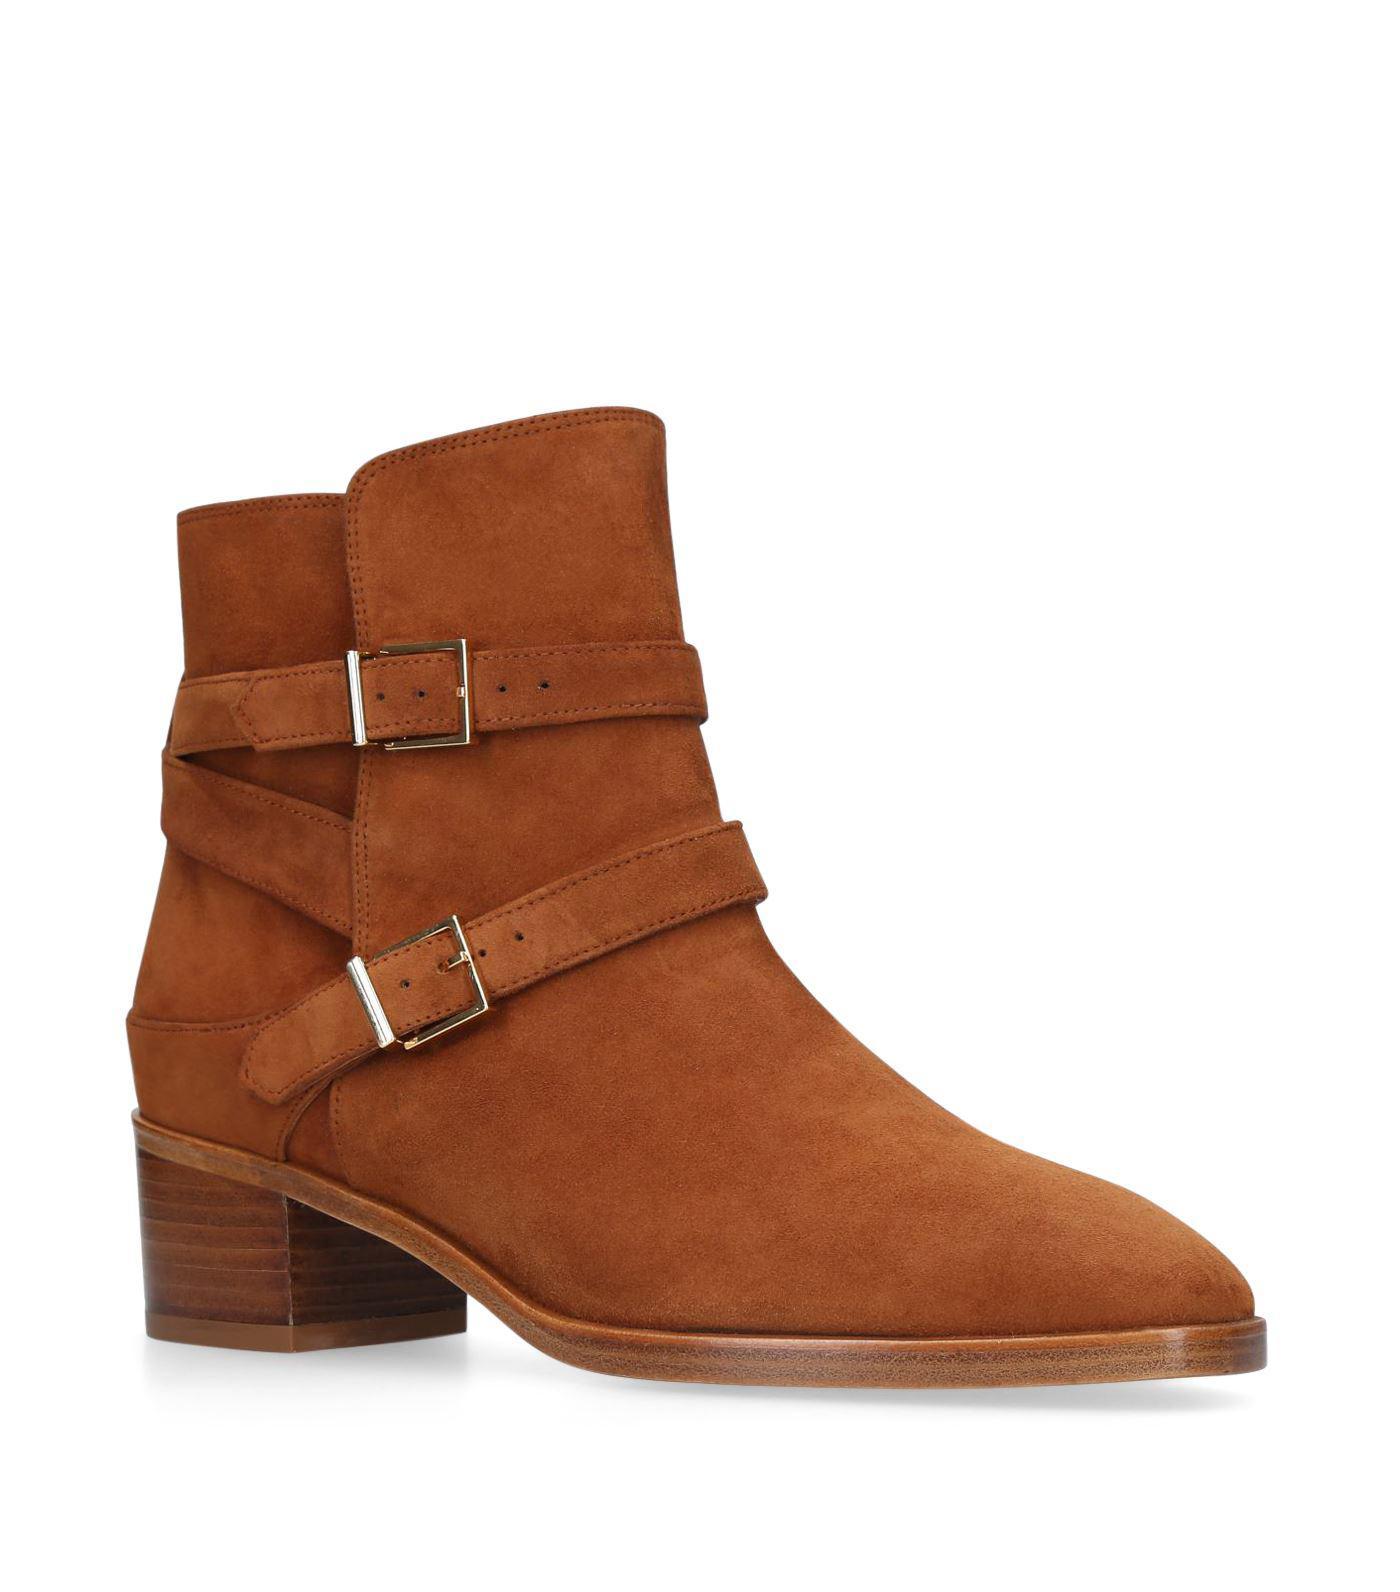 Sadie Suede Ankle Boots - Brown Stuart Weitzman 027NaCZorD